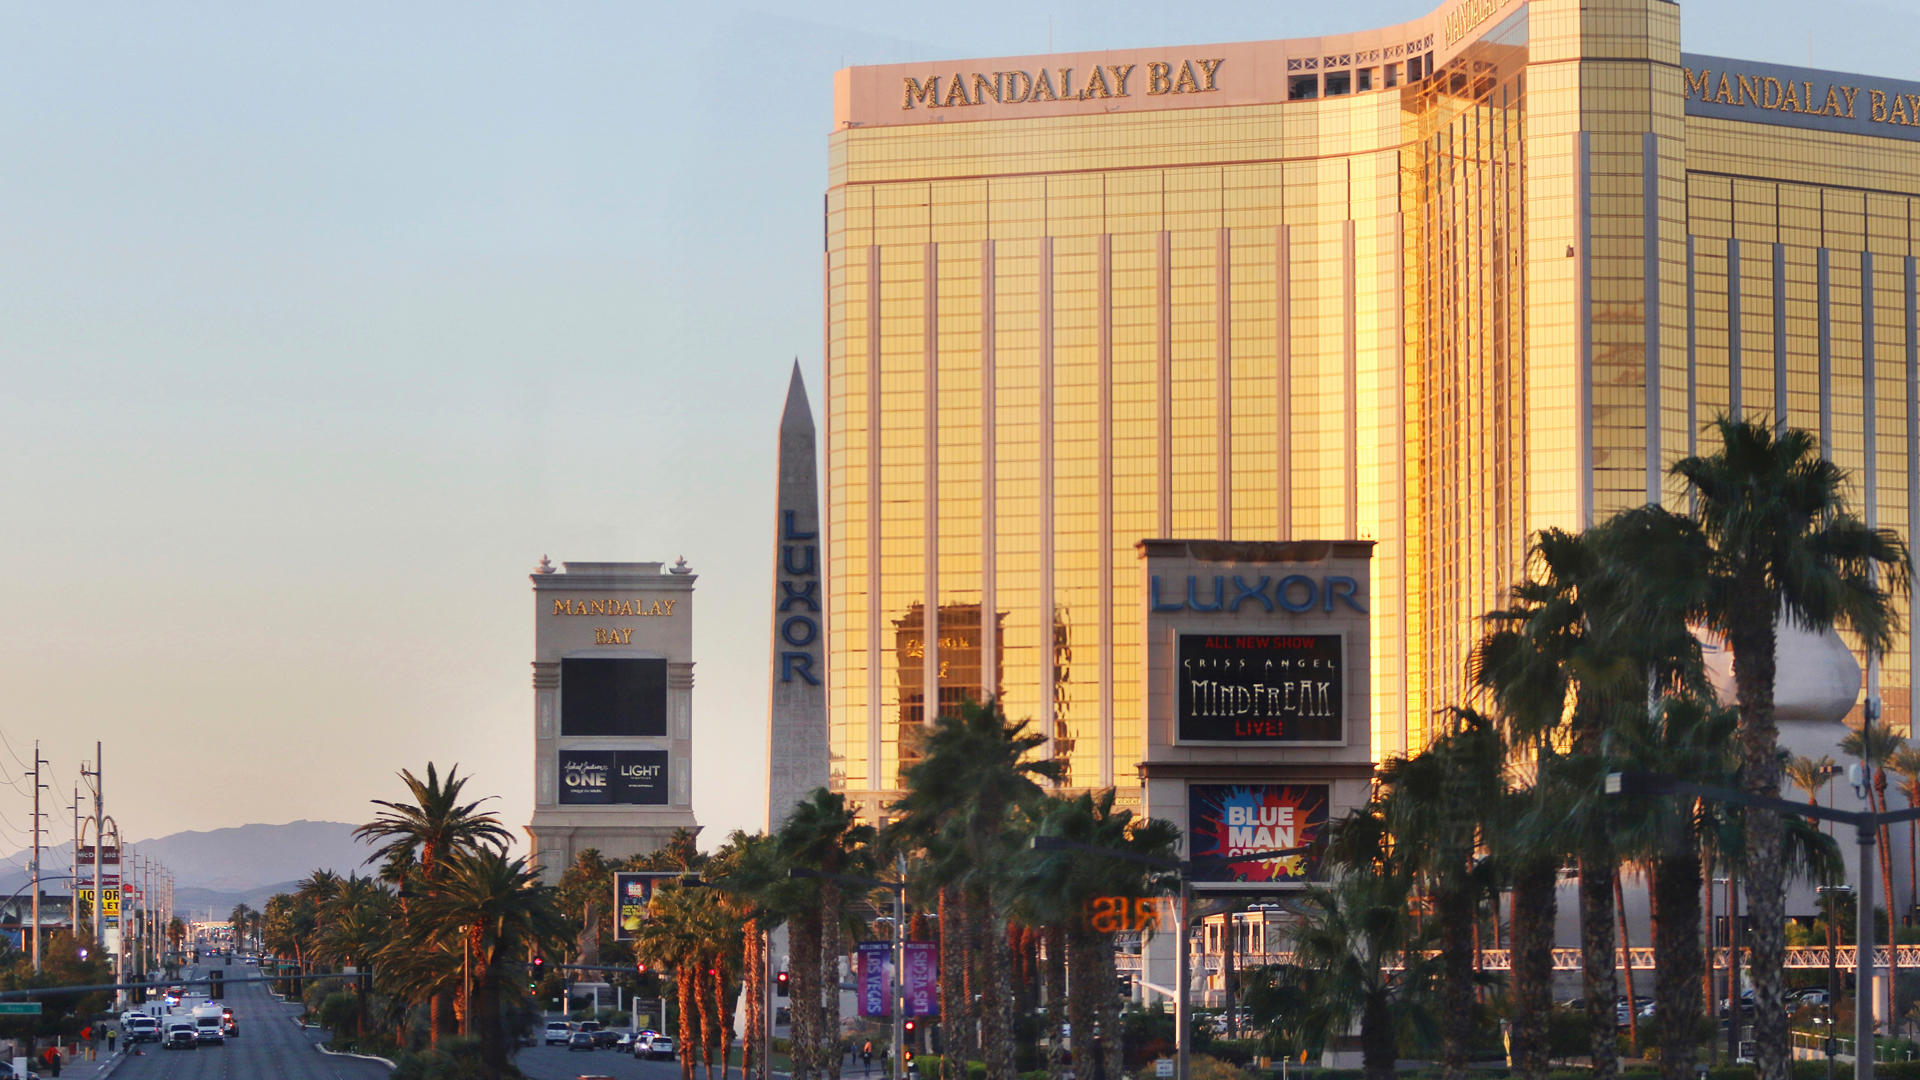 Mandalay Bay Hotel & Casinos in Las Vegas